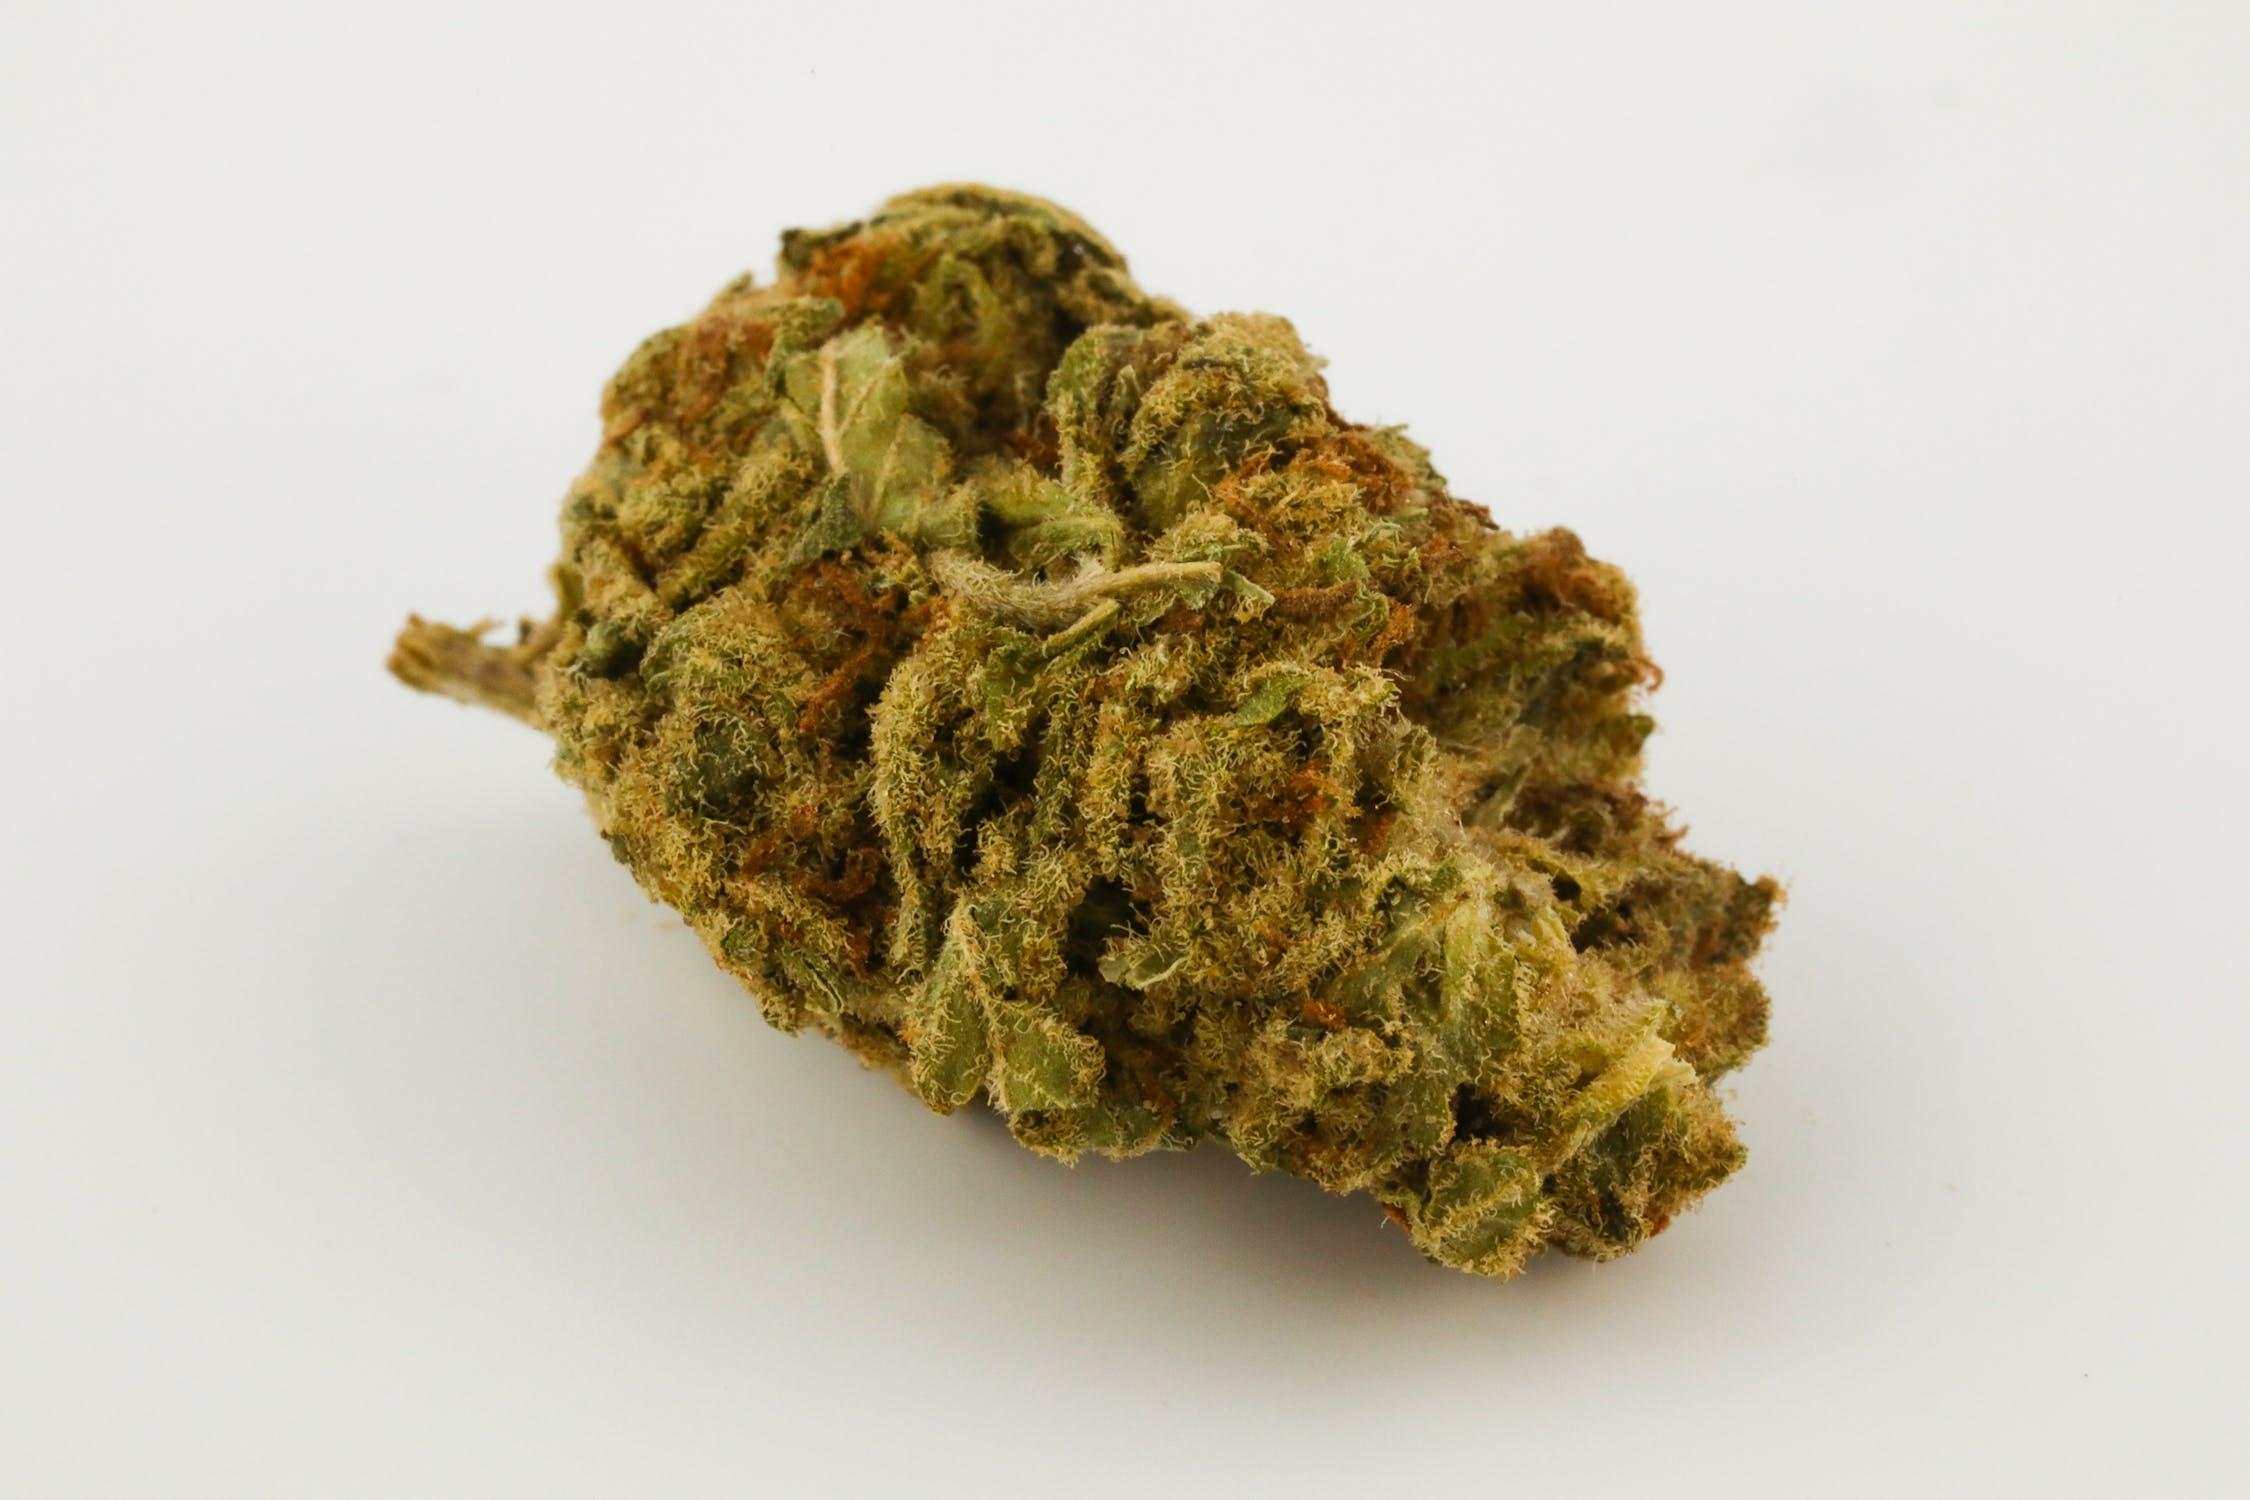 Sour Grape Weed; Sour Grape Cannabis Strain; Sour Grape Hybrid Marijuana Strain